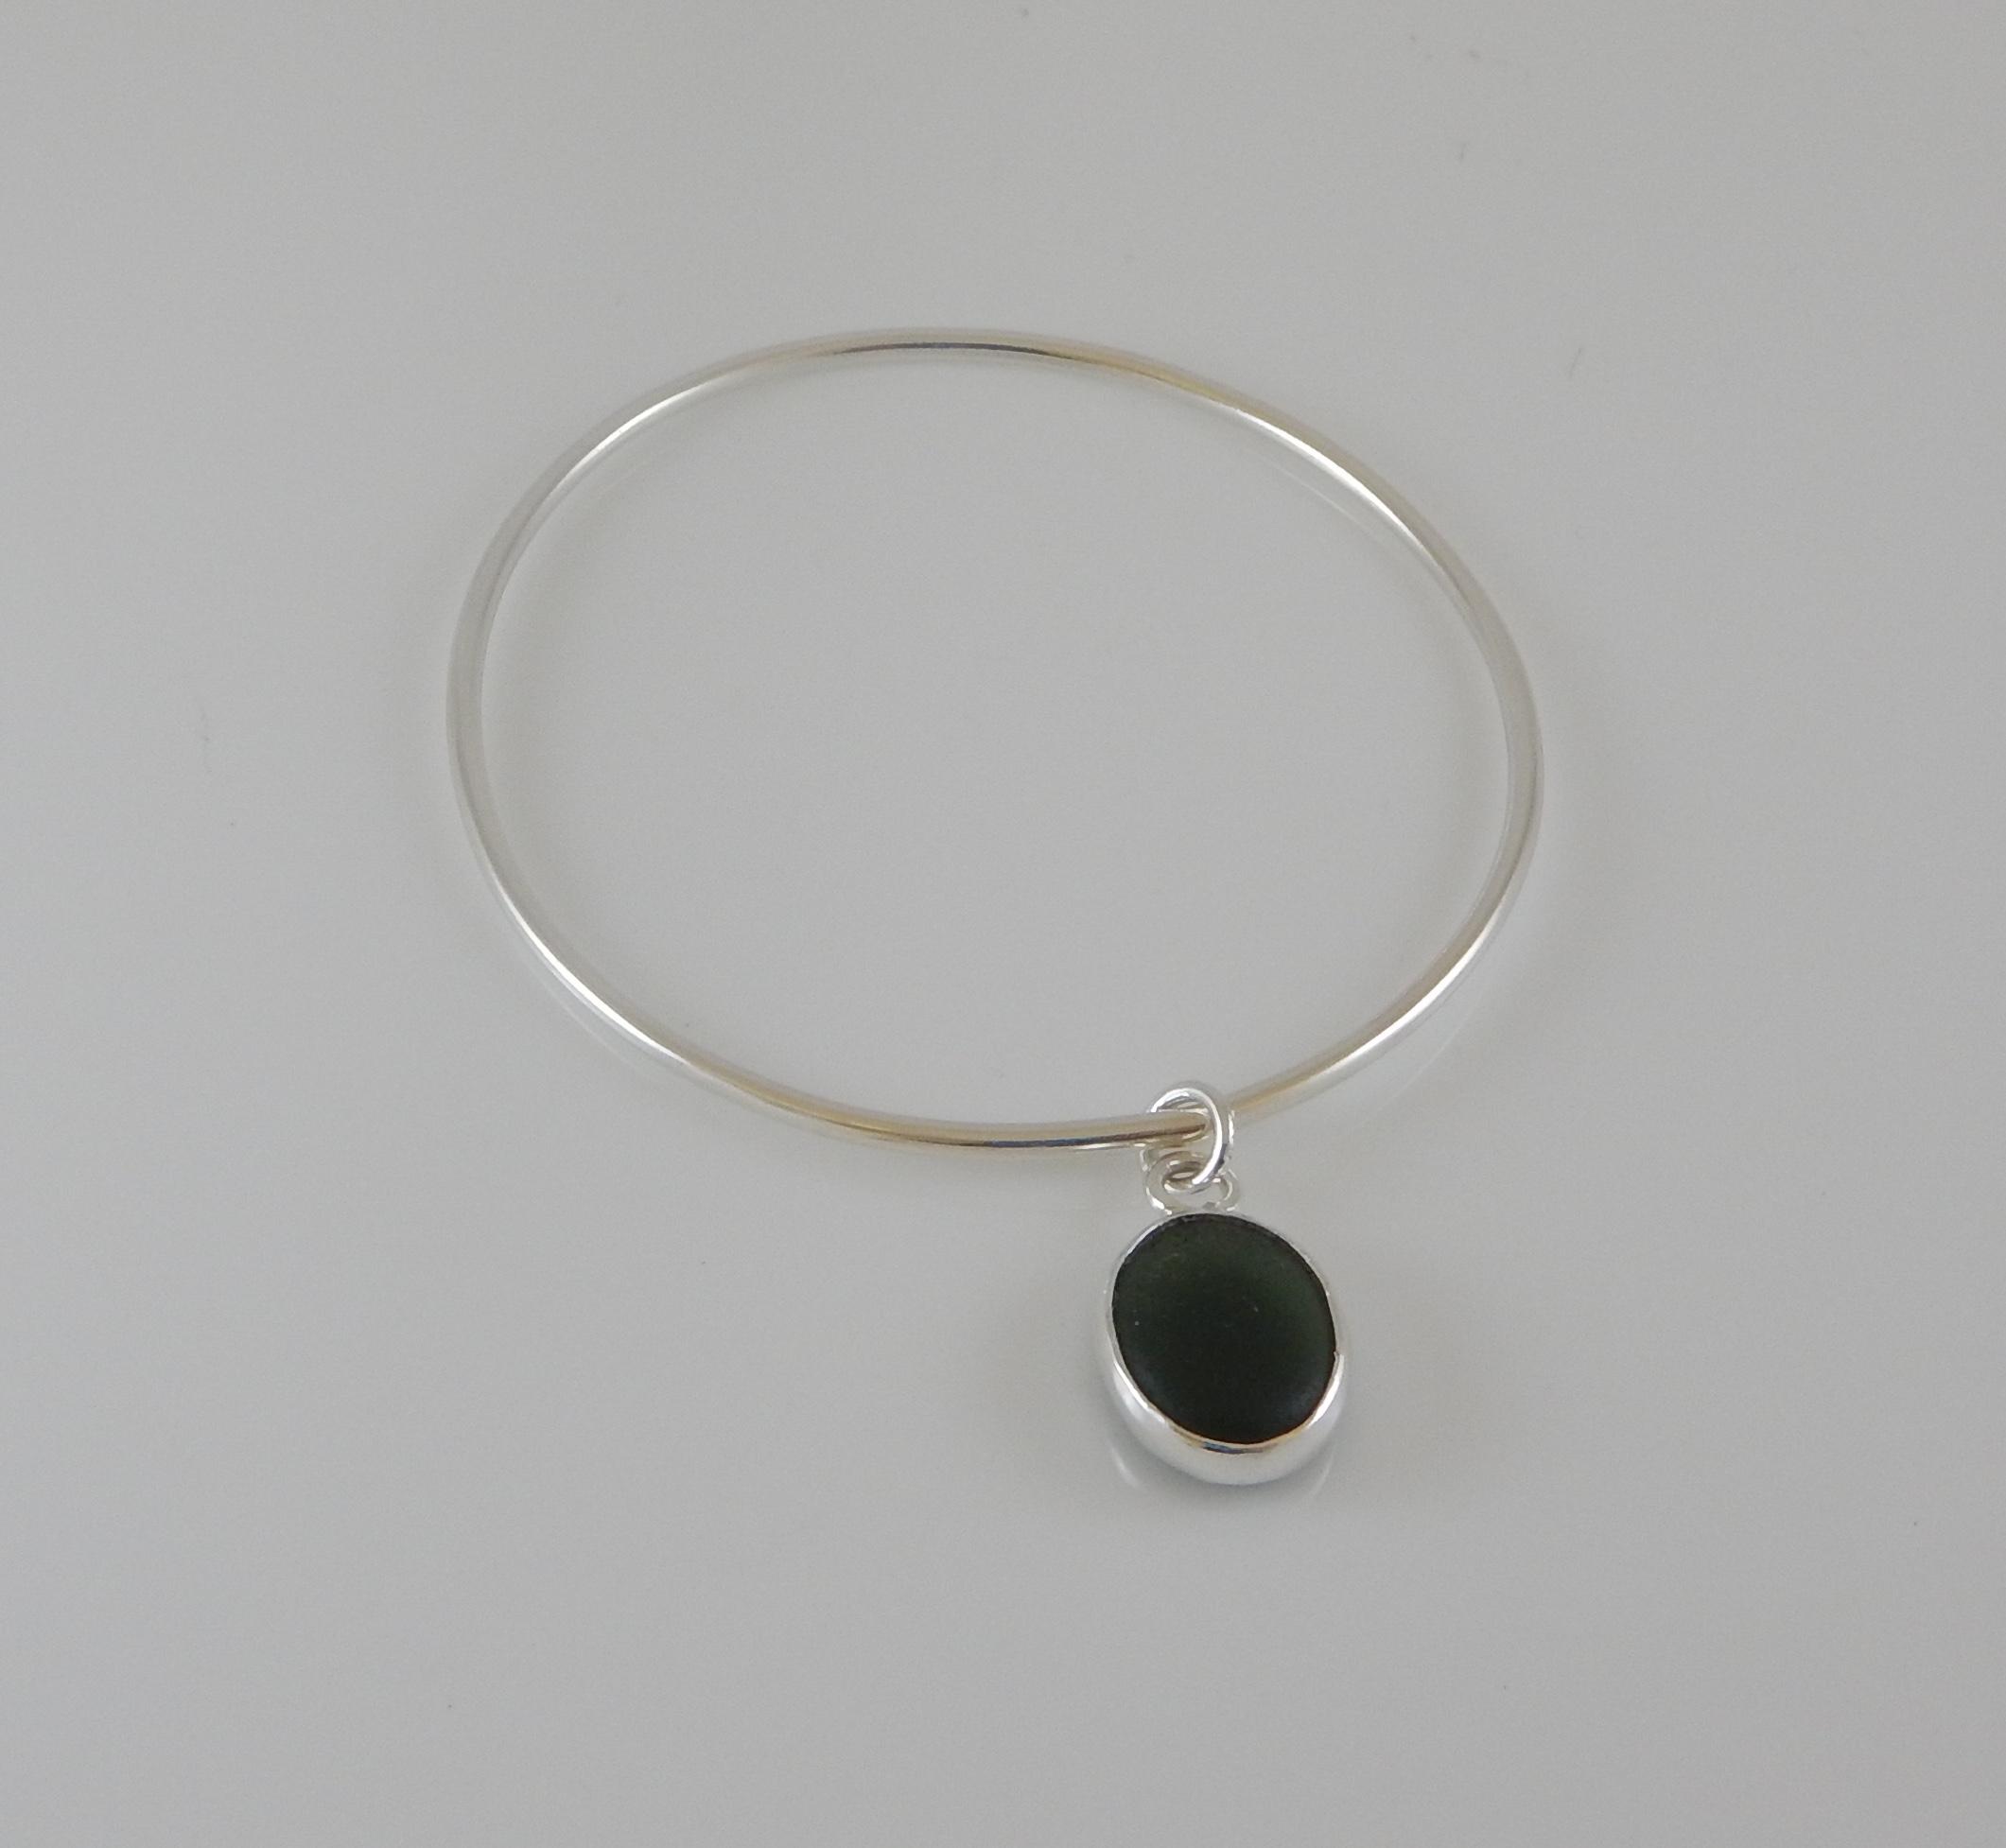 Eco-silver Green Seaham Sea Glass Bangle